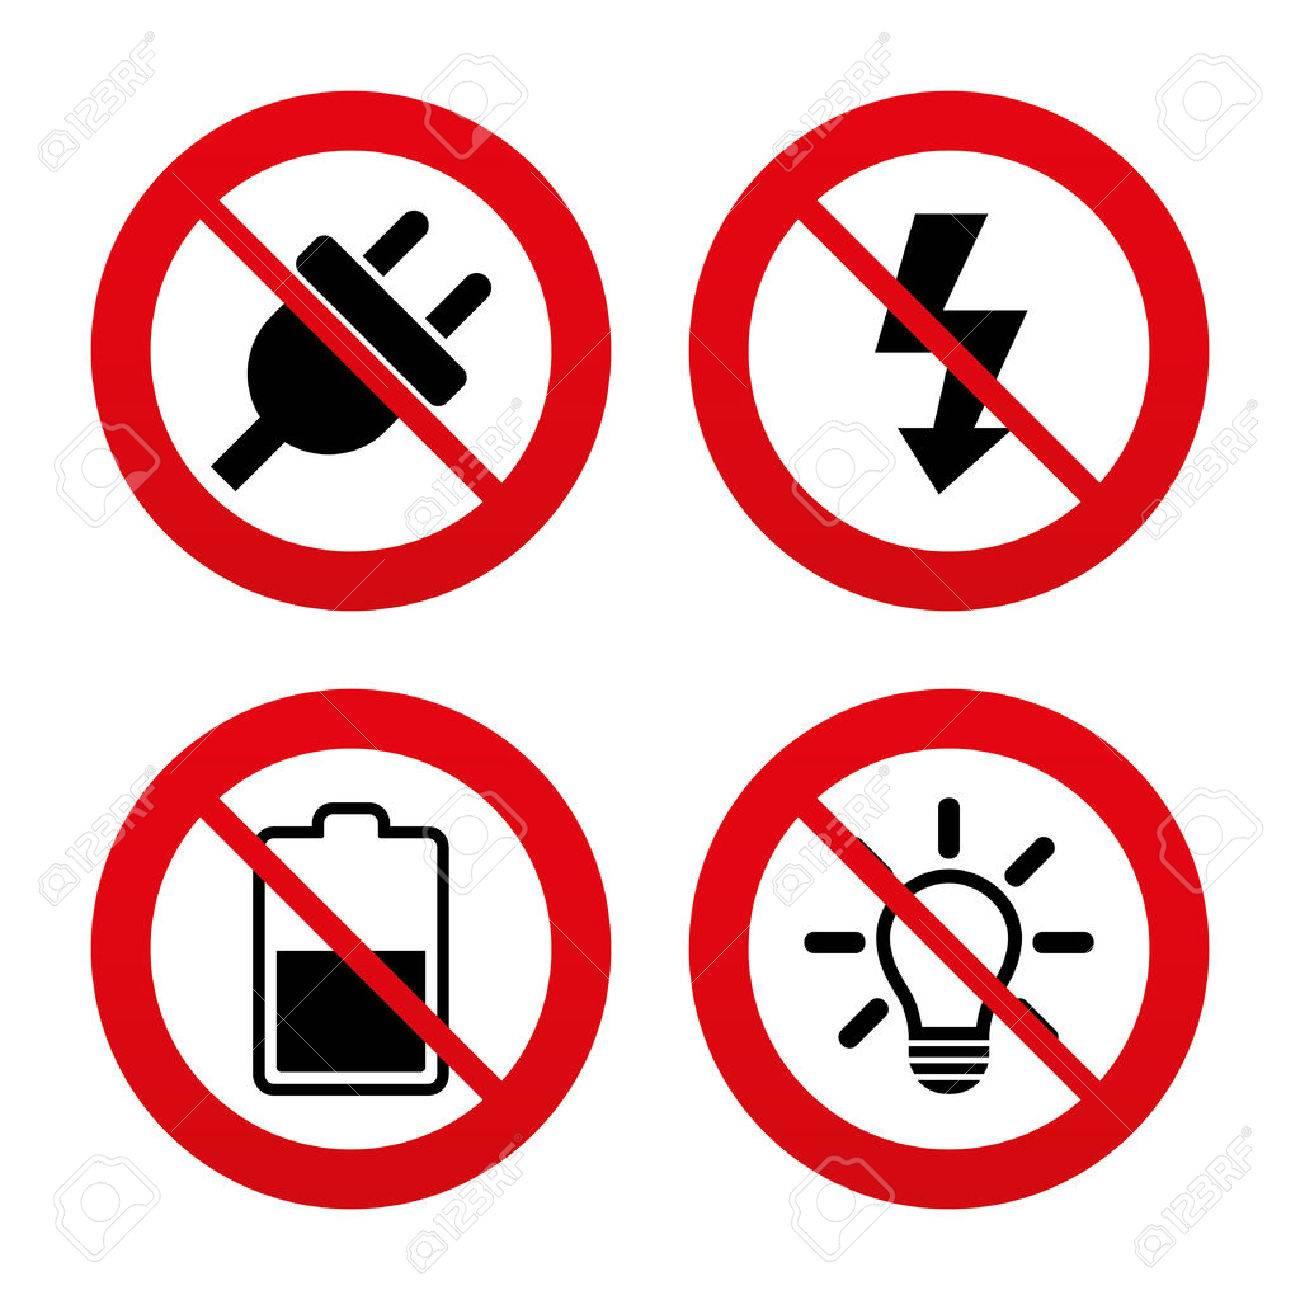 Výsledek obrázku pro zákaz elektřina